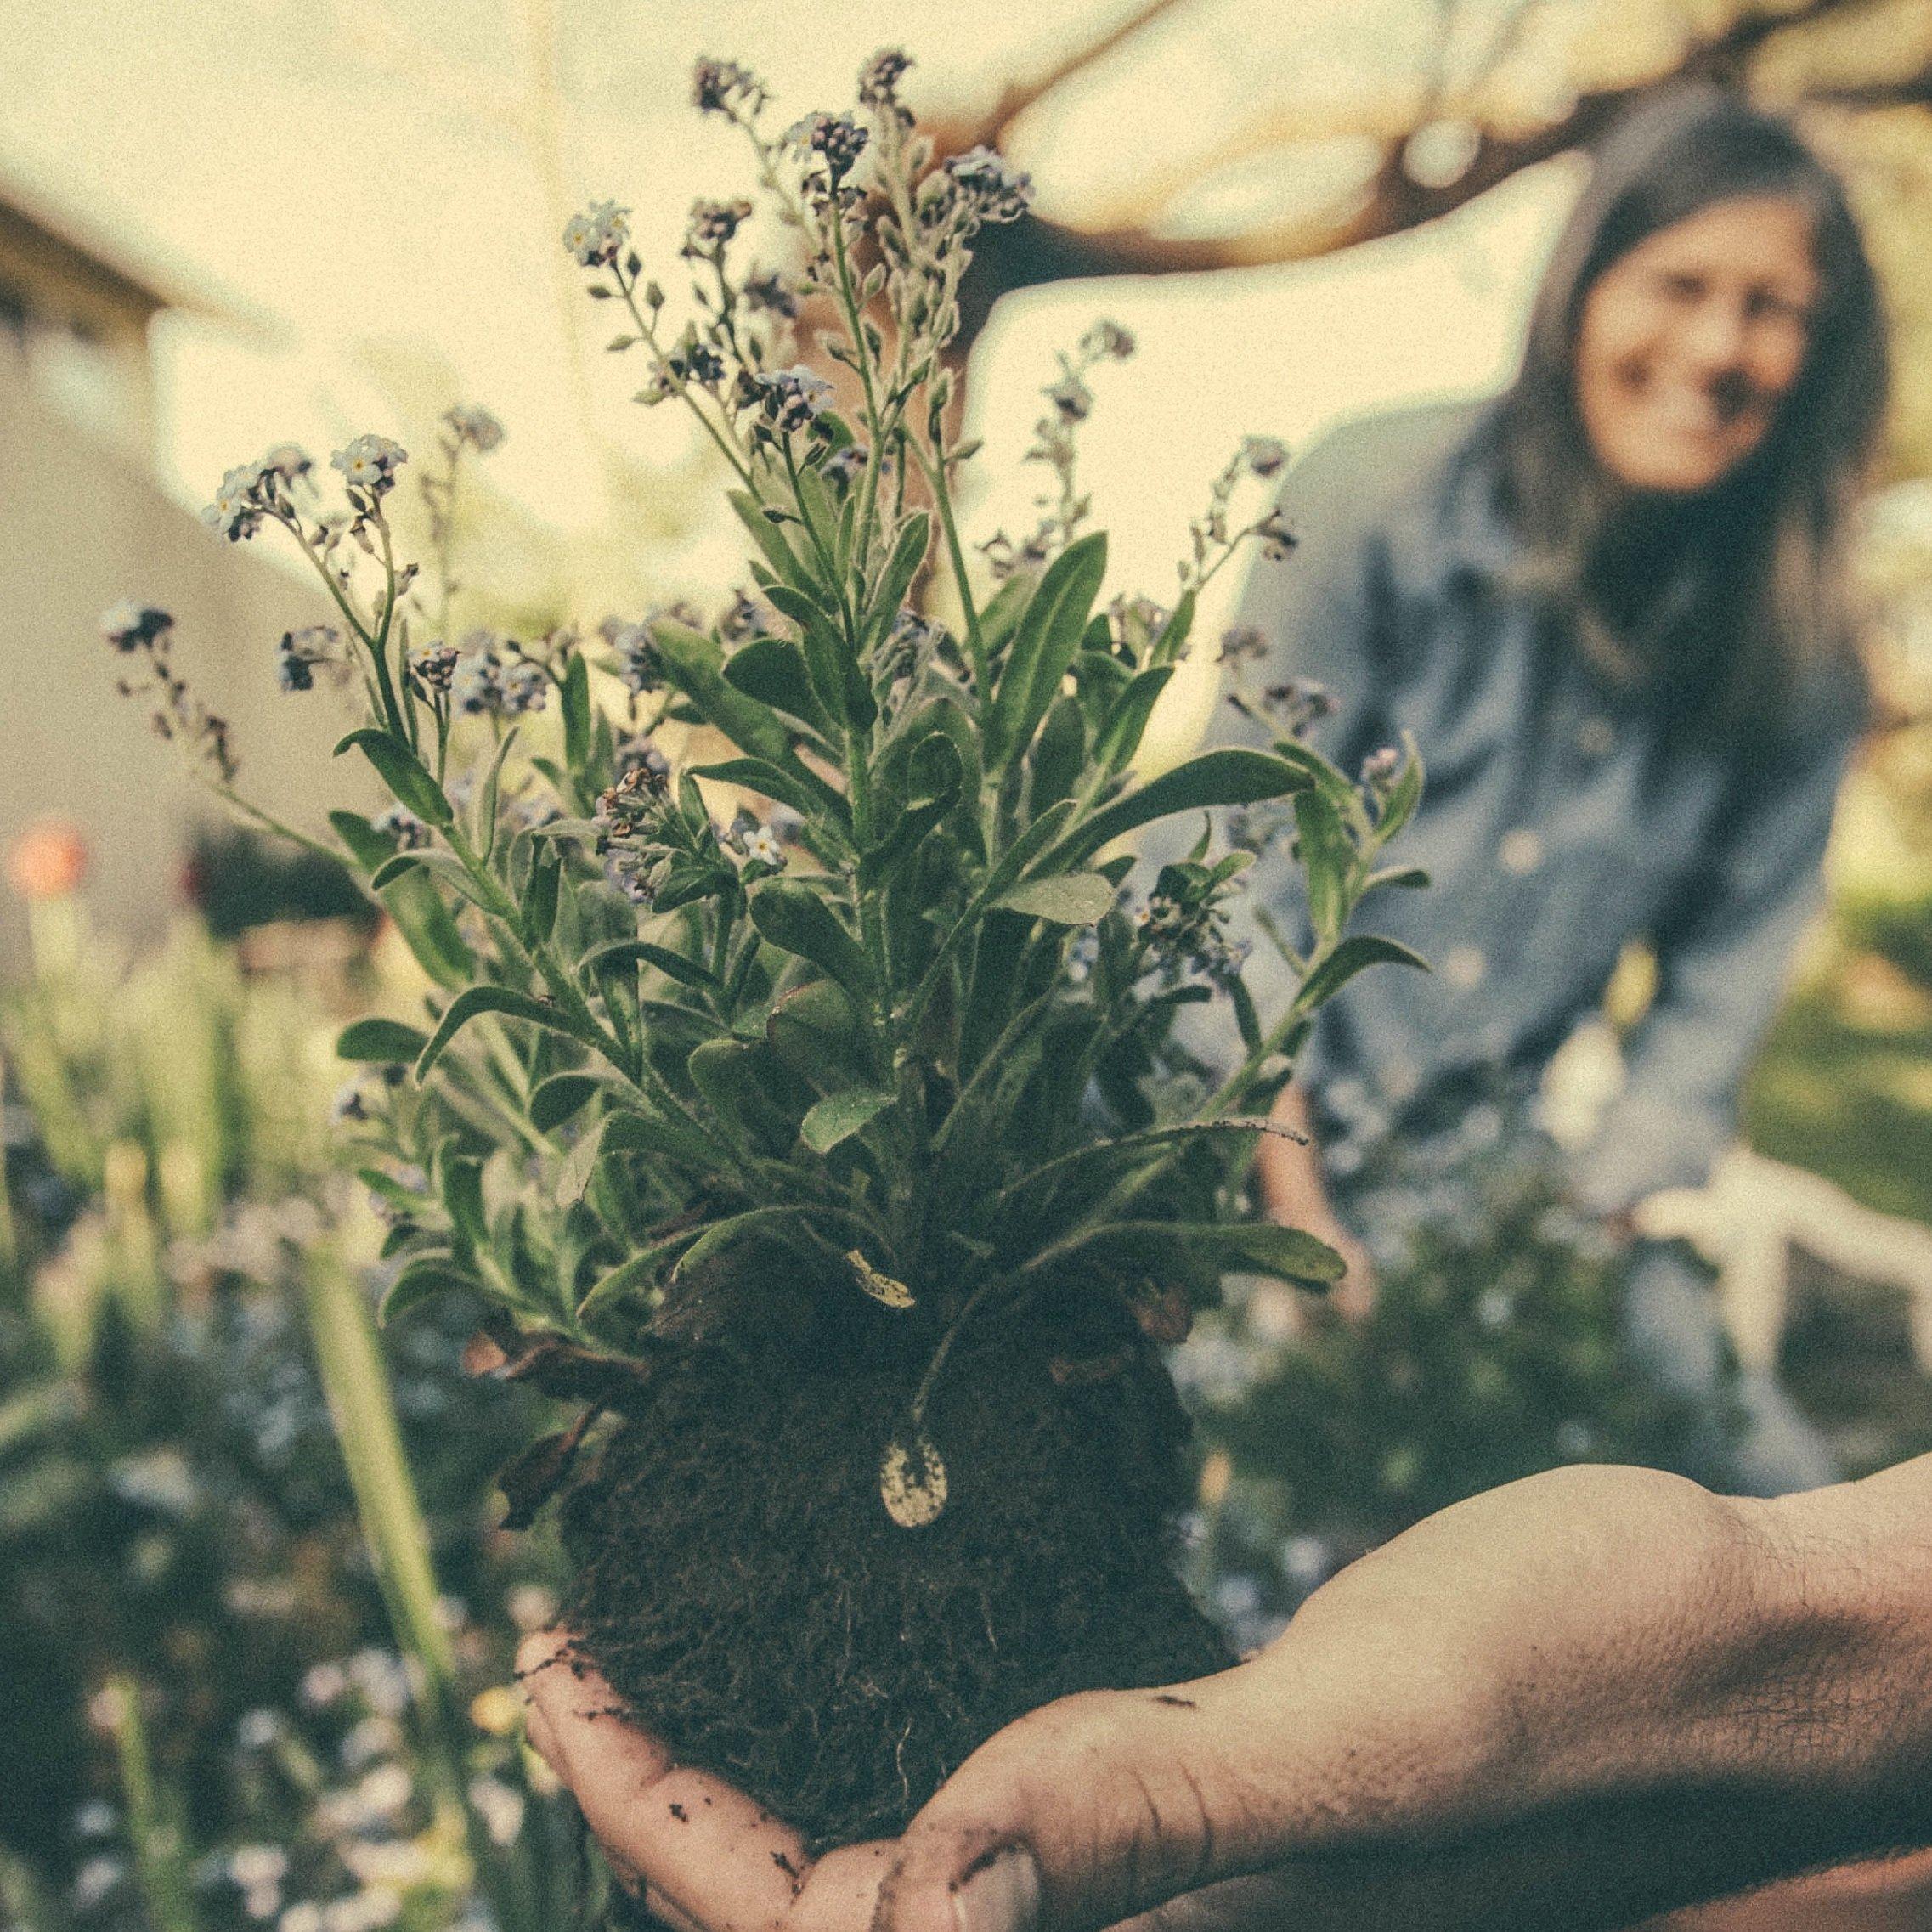 Gardening Hand Square (1)